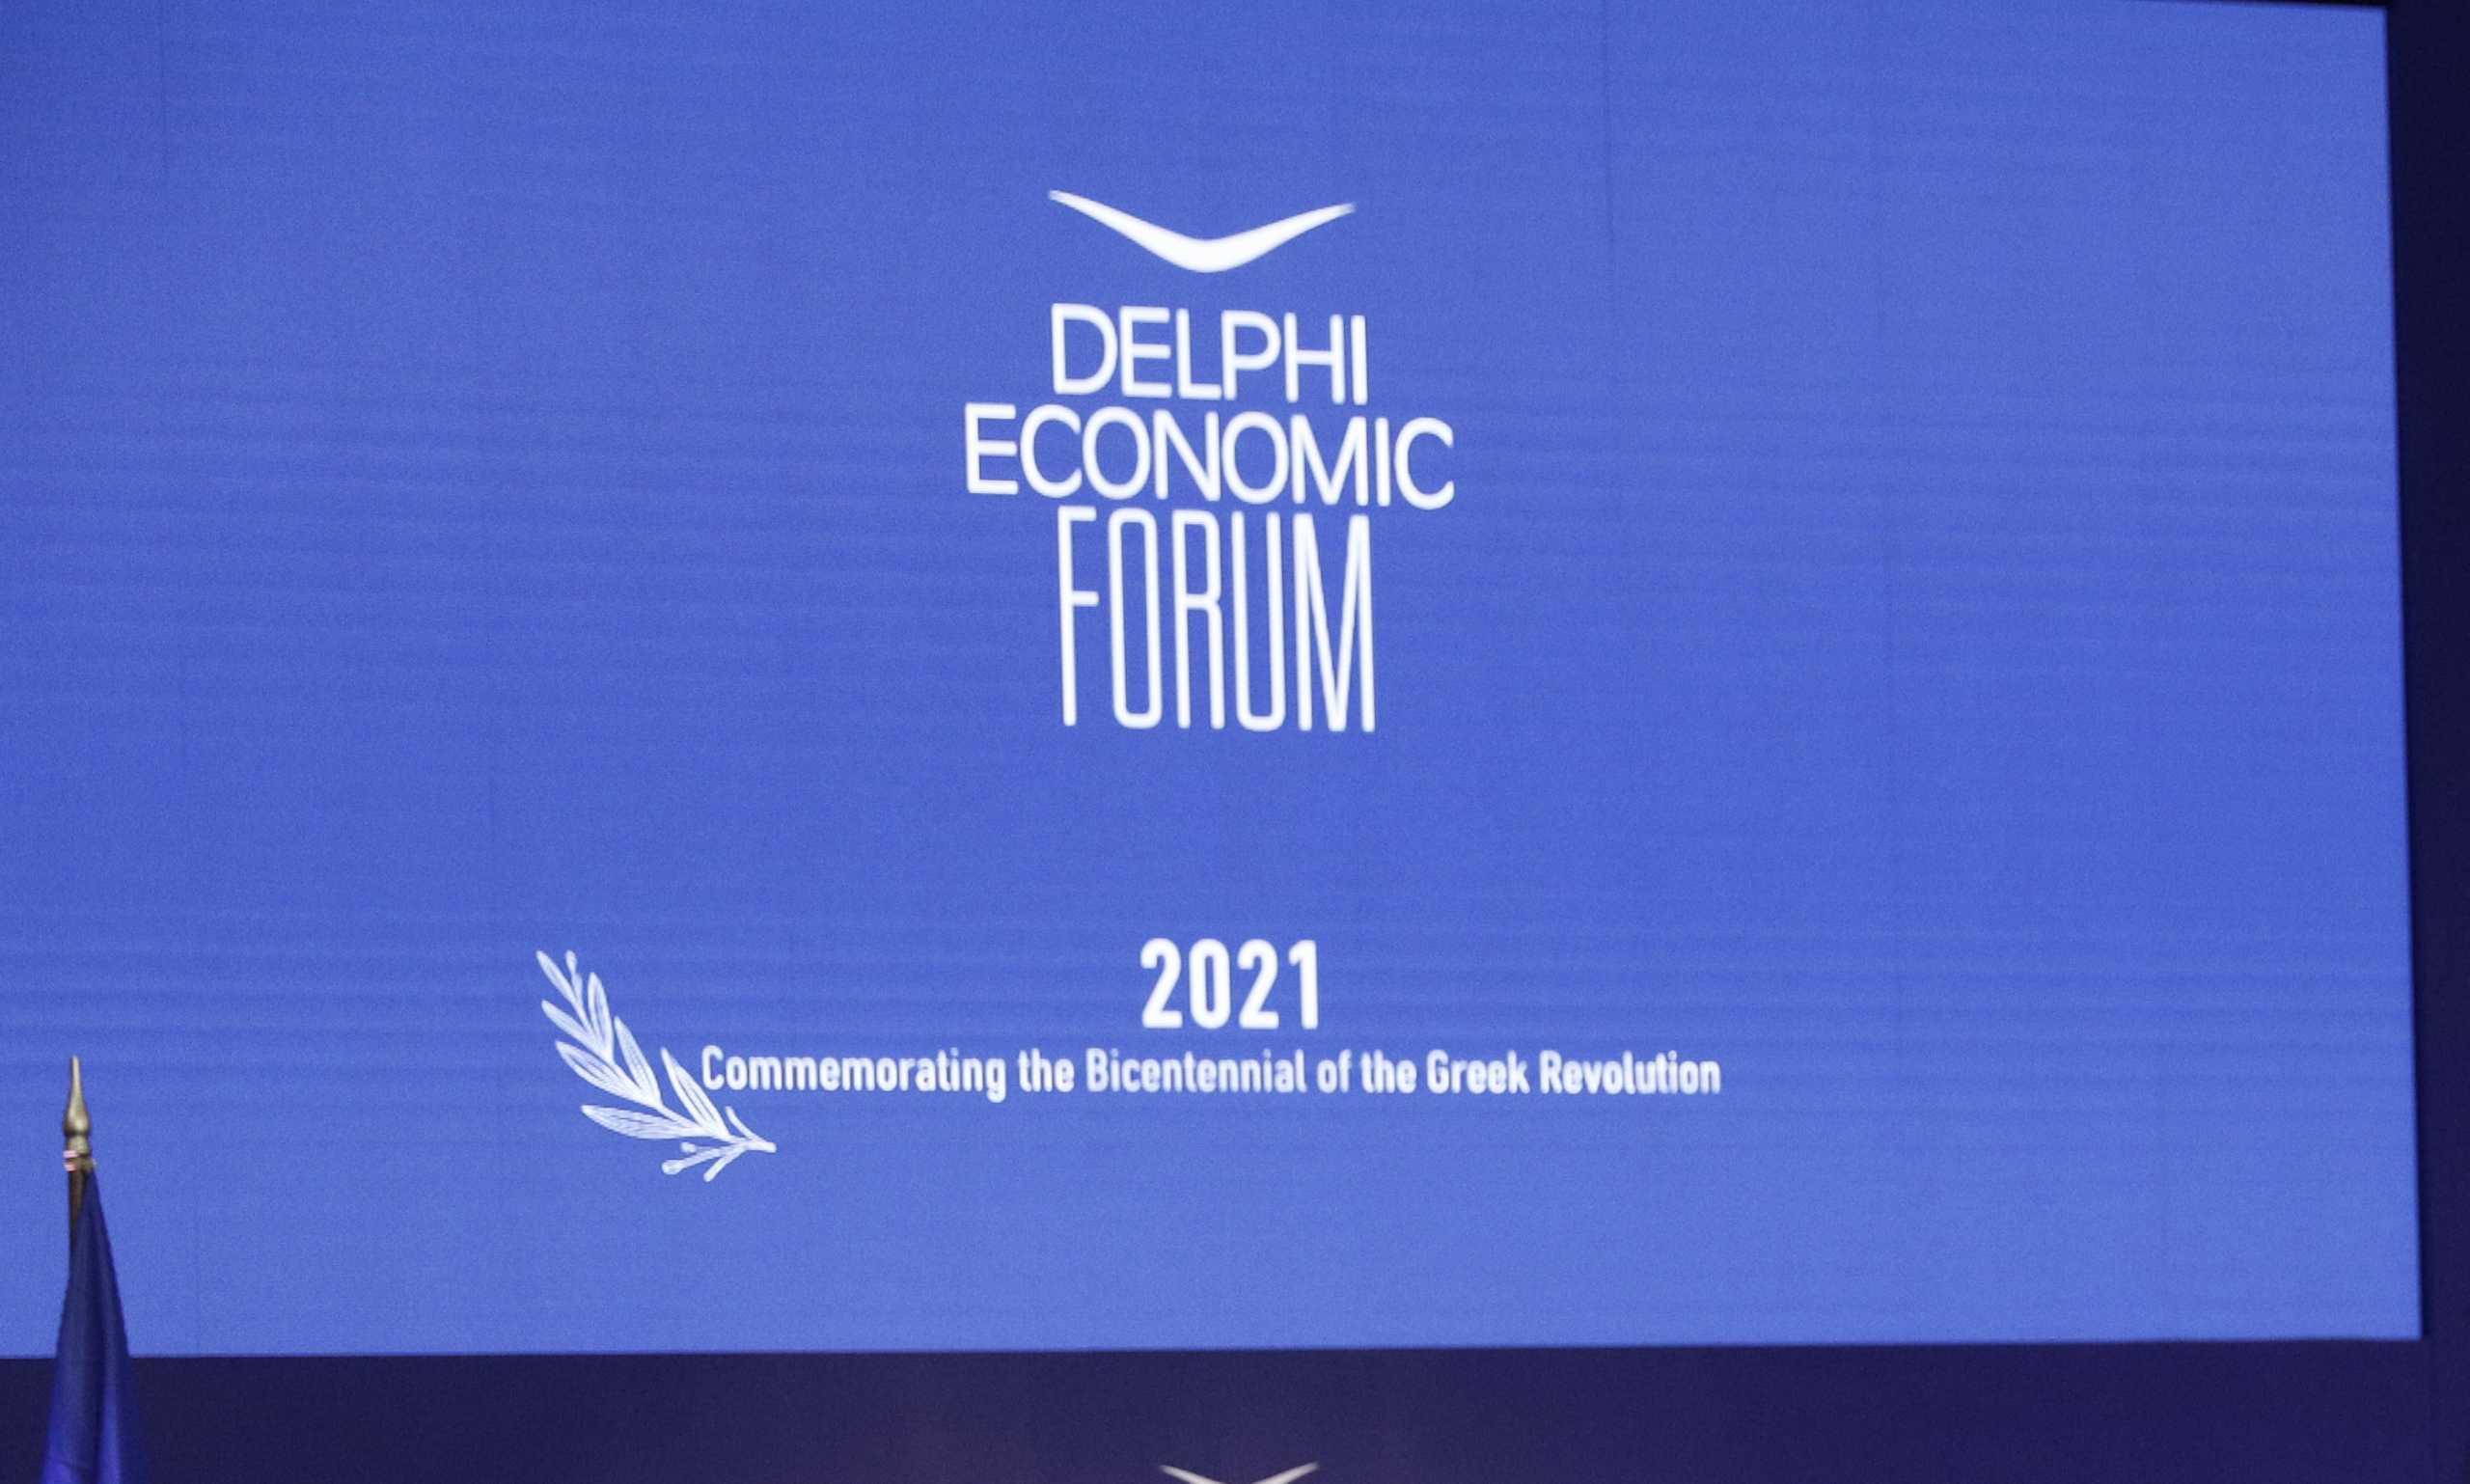 ICCWomen Hellas: Μιμή Ντενίση, Ευγενία Μανωλίδου και 4 ακόμη γυναίκες στο Οικονομικό Φόρουμ των Δελφών